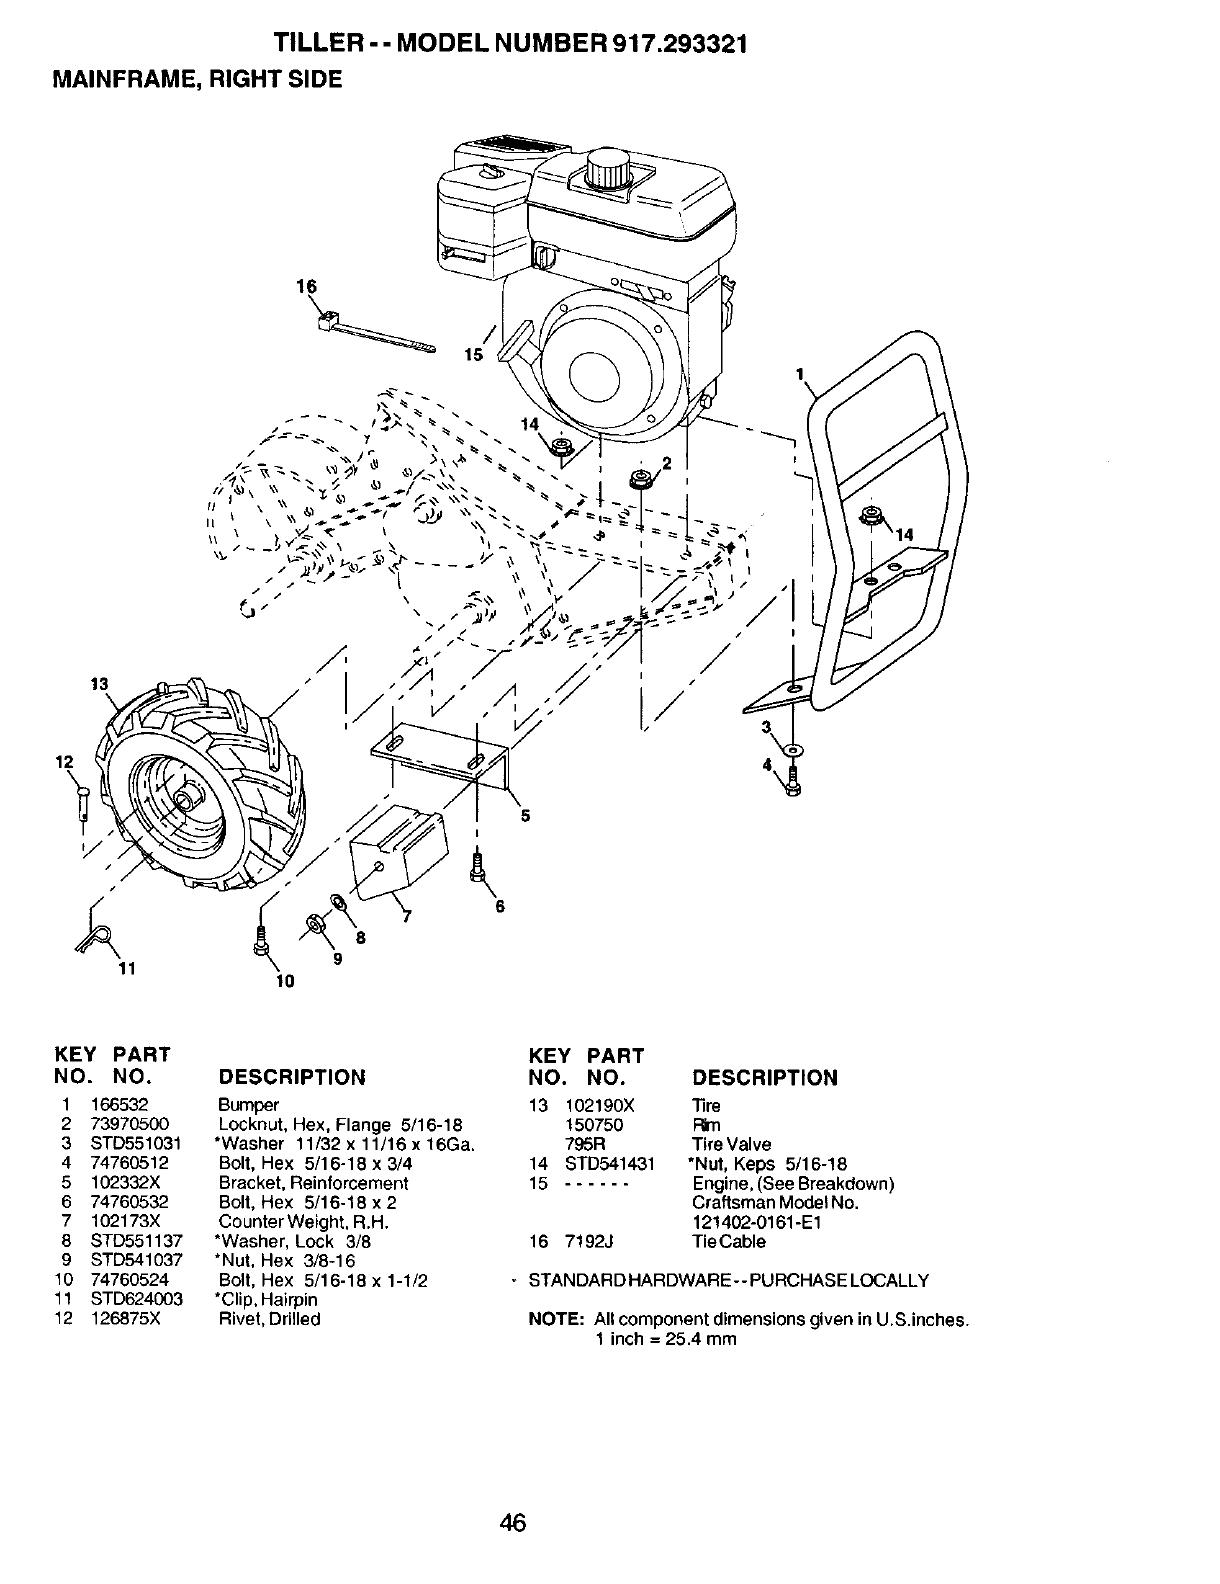 Craftsman 917293321 User Manual 6.5HP REAR TINE TILLER